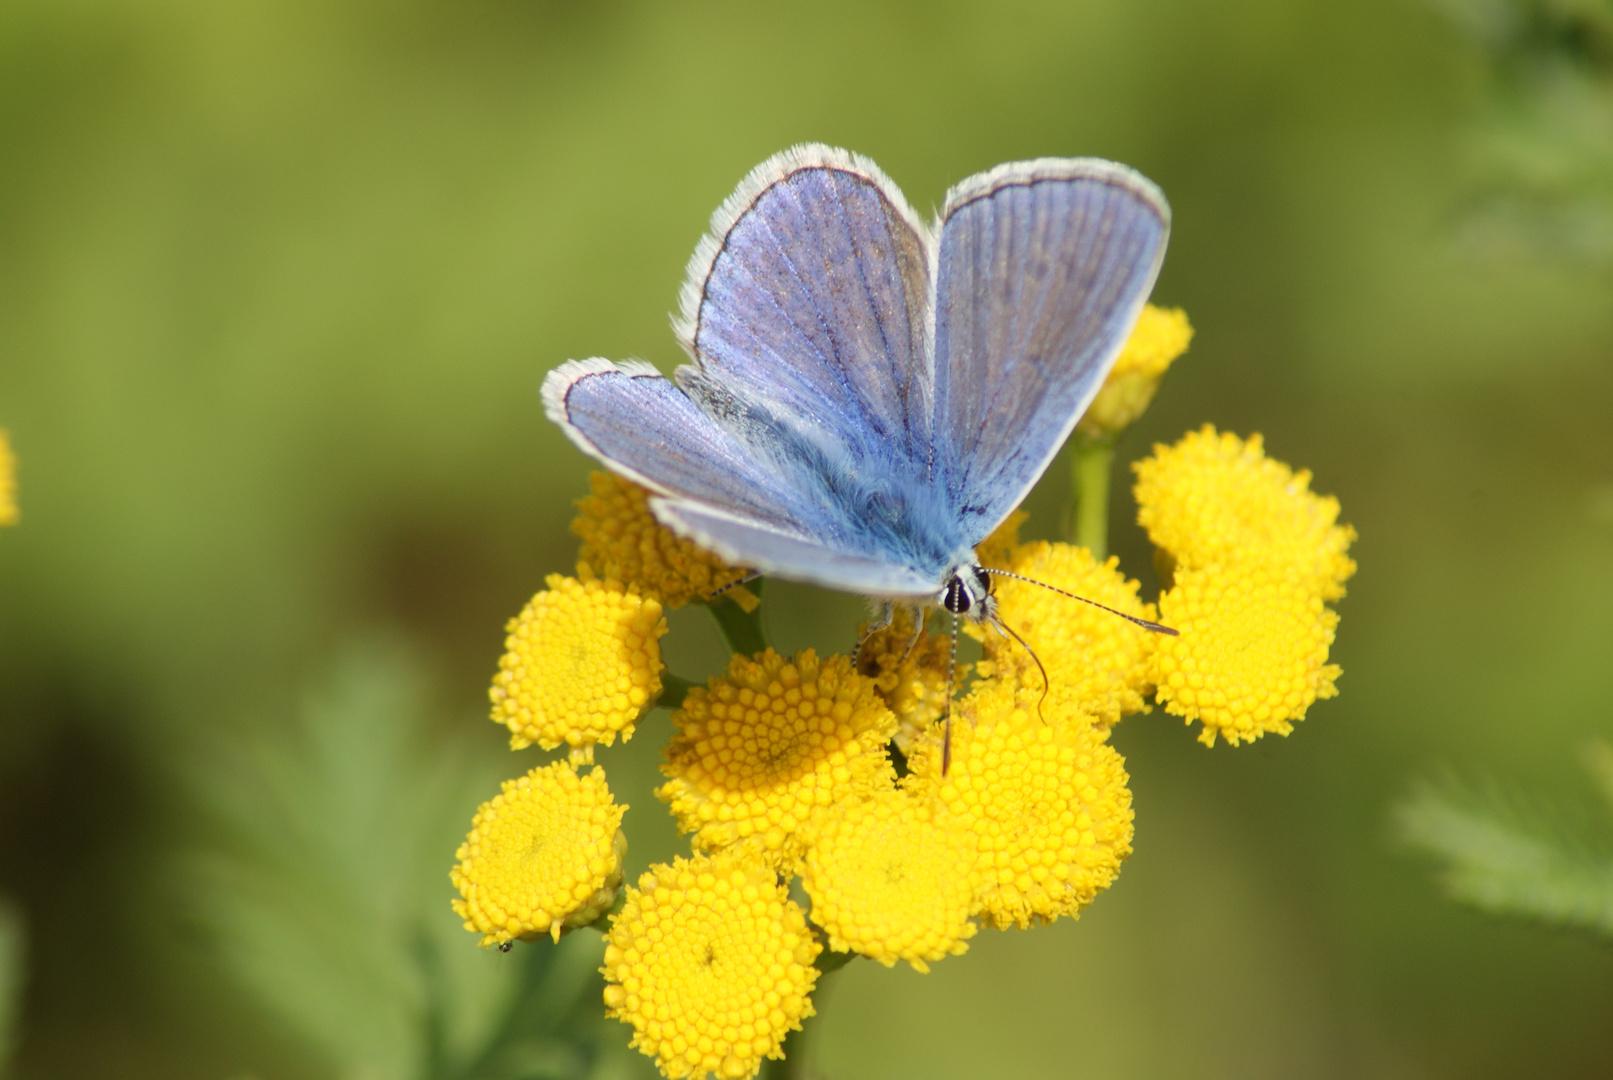 Herr Blau